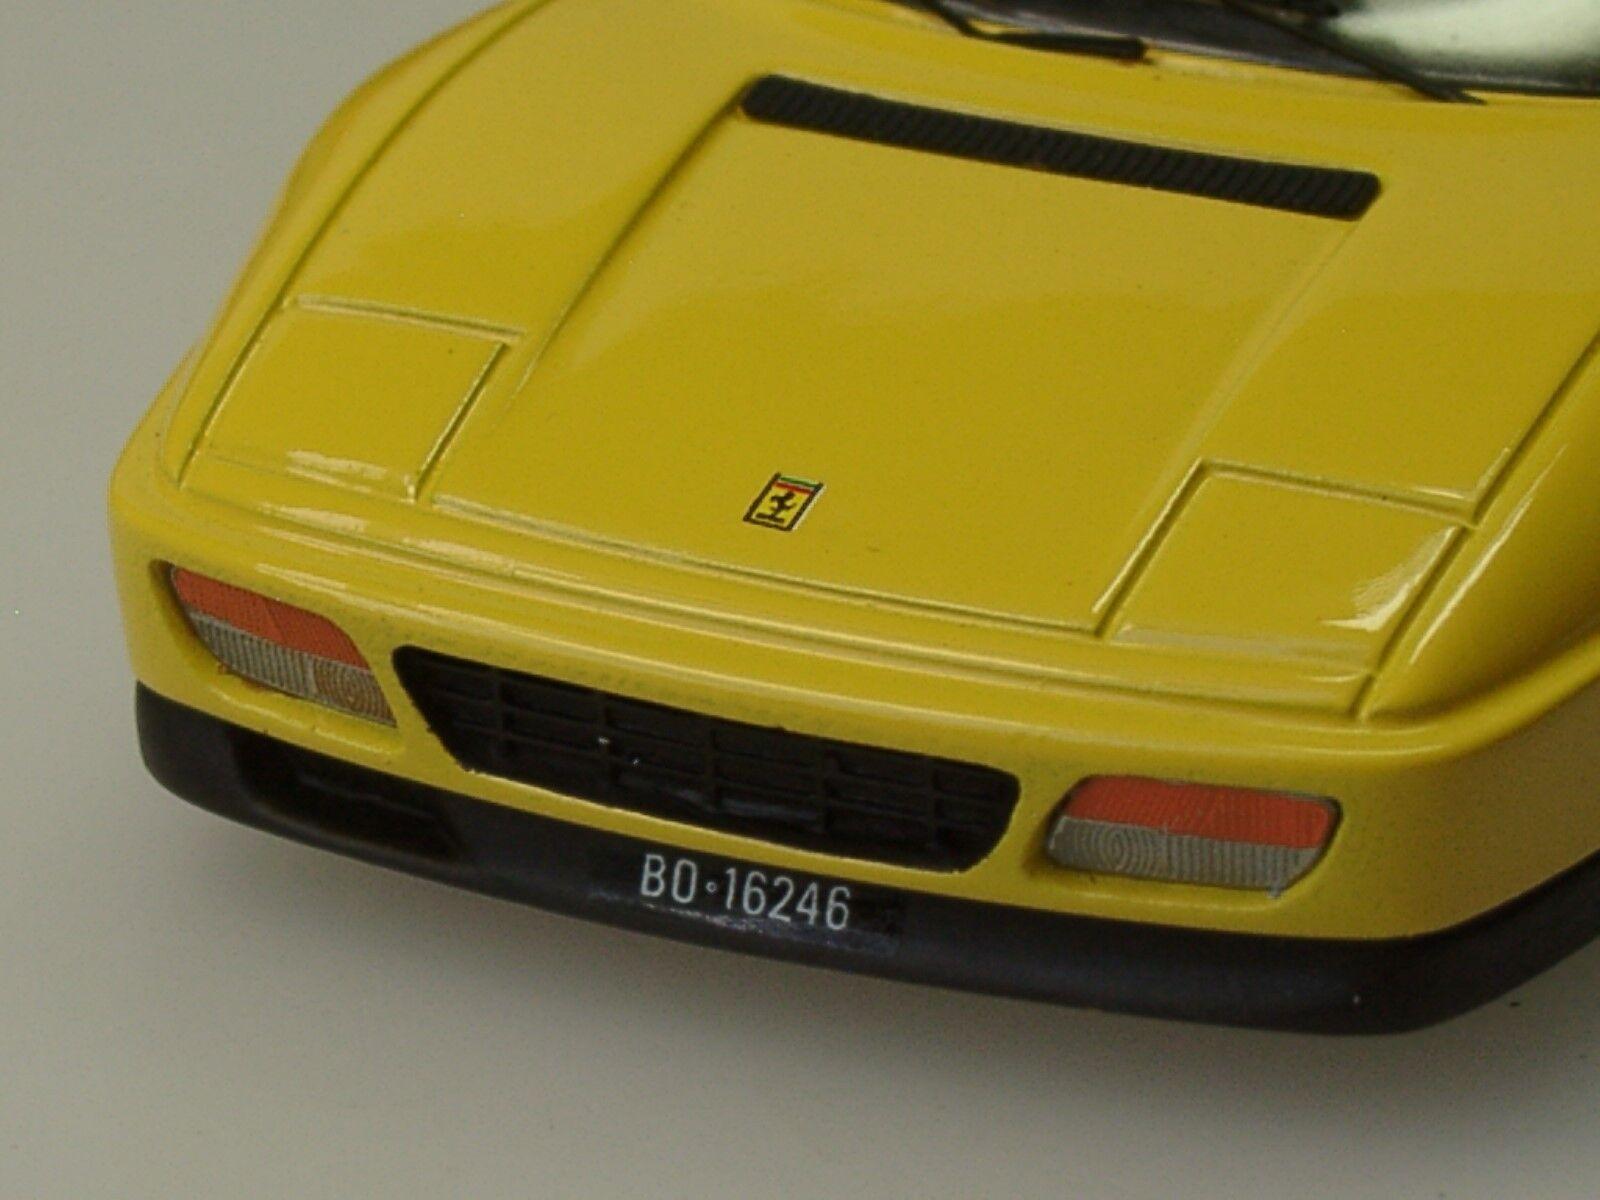 Century Ferrari 348 GTB, 1990, jaune - 1901 - 1:43, 1:43, 1:43, vieux, mais content 21033f